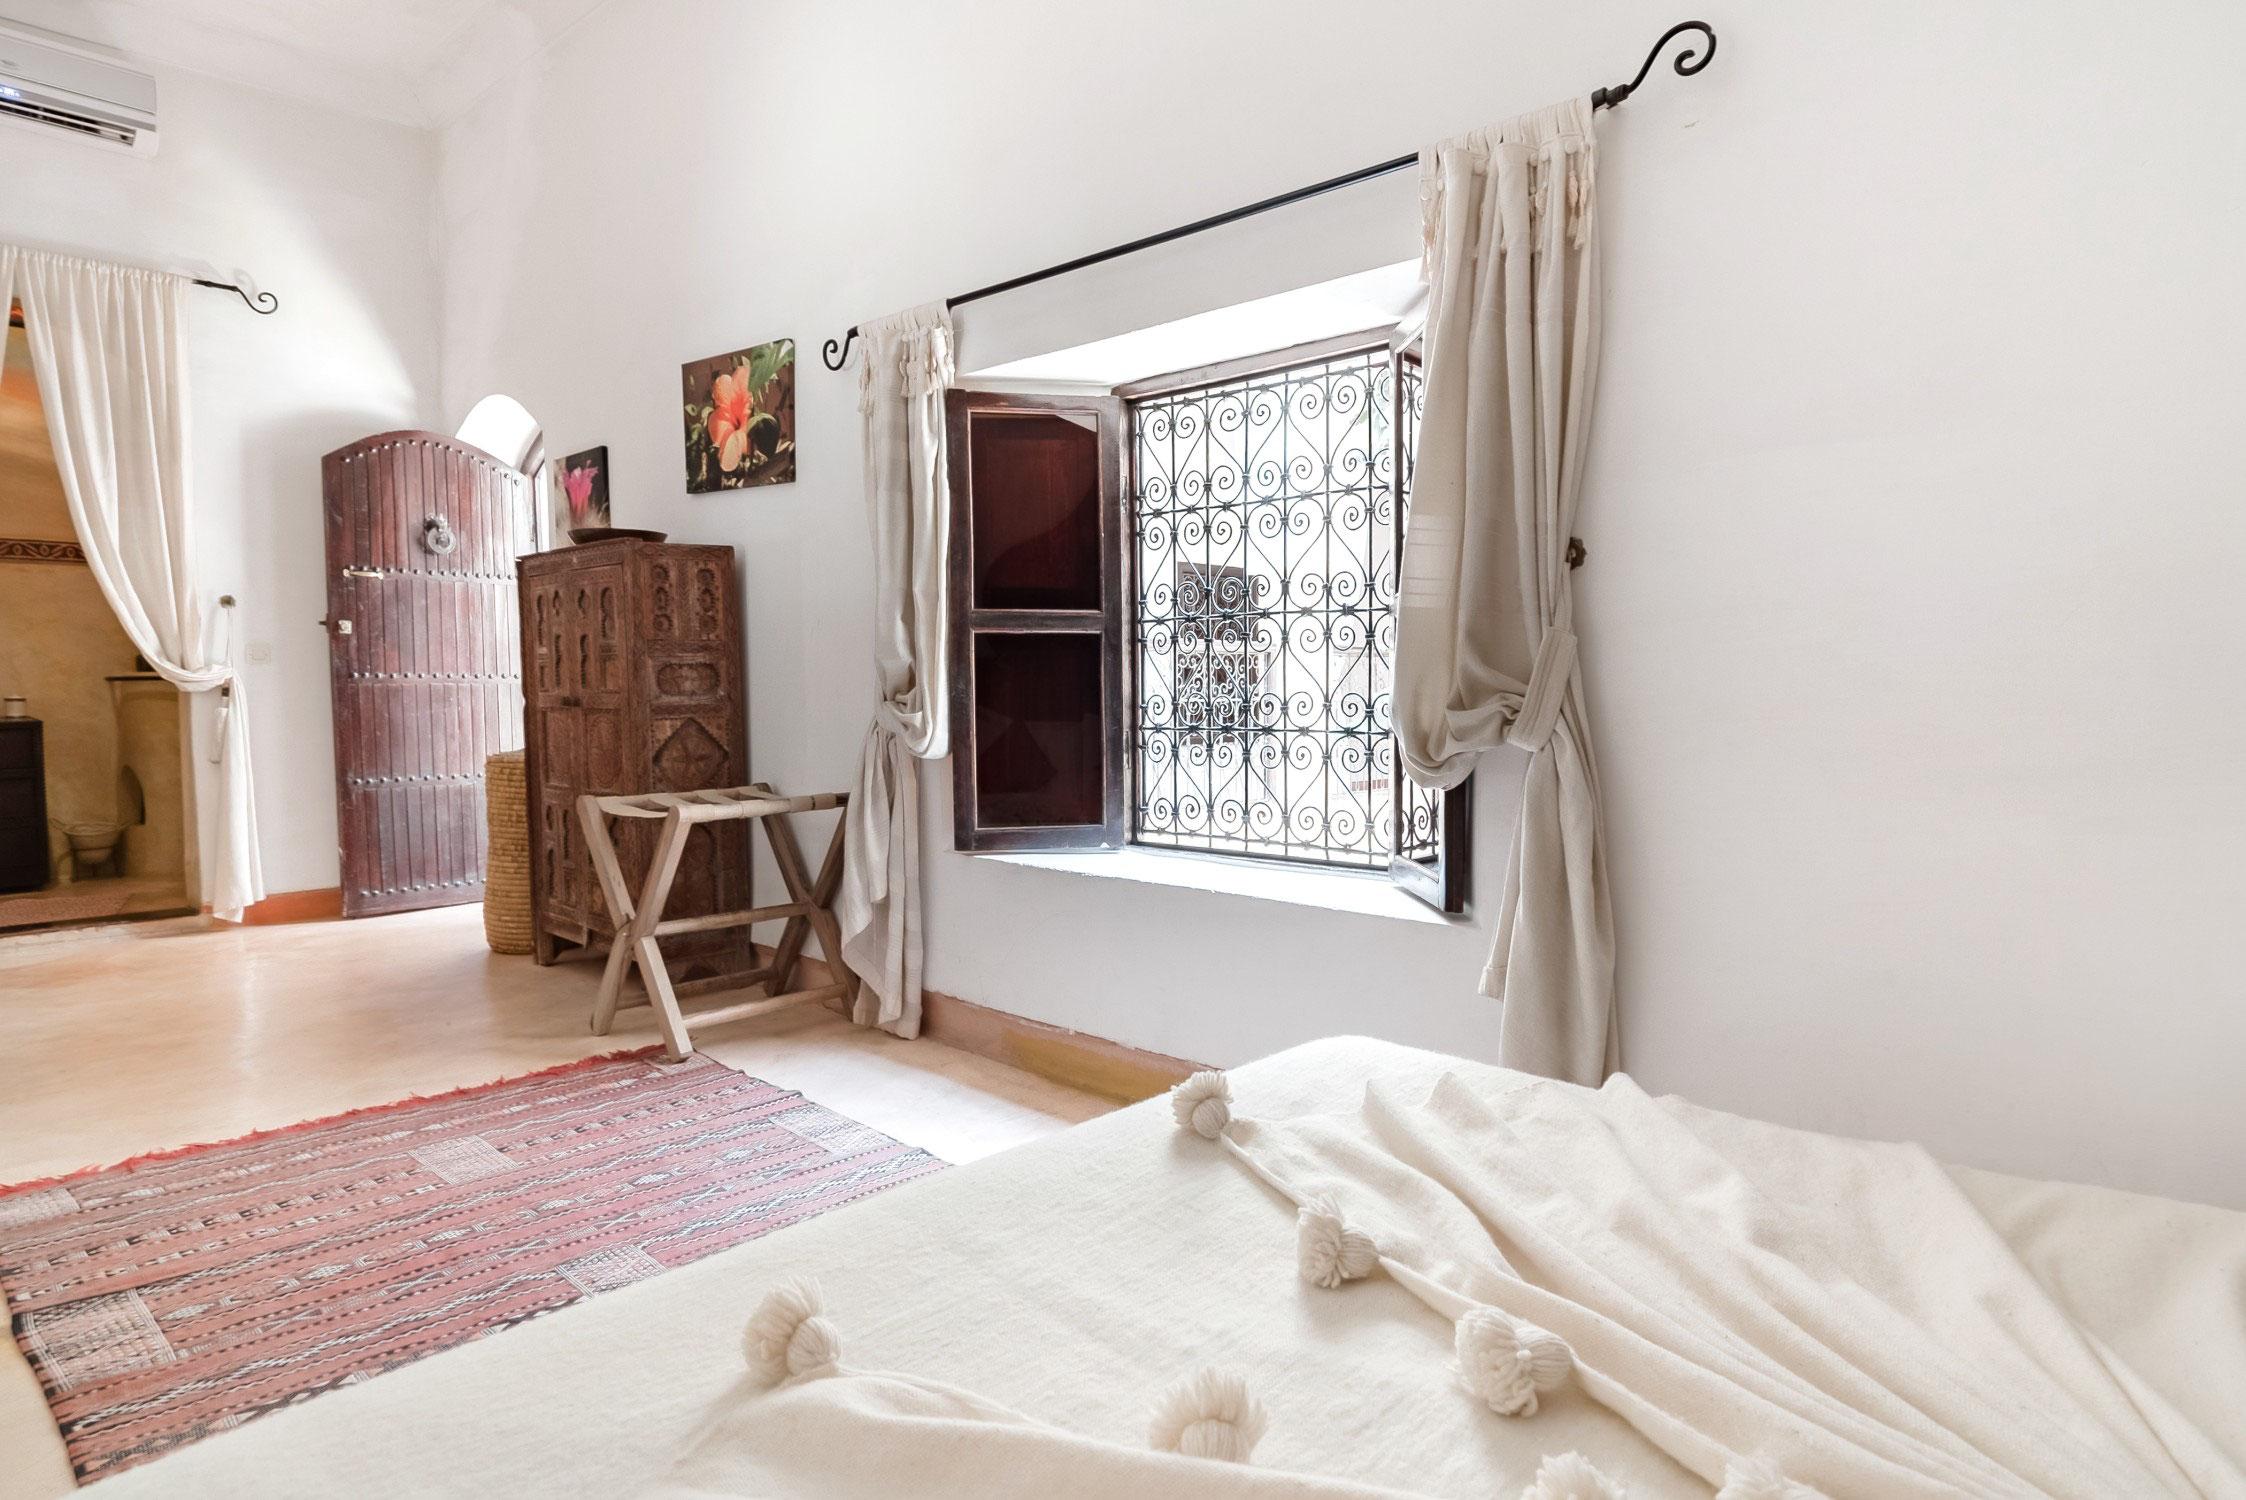 Miraculous Riad Naila Marrakesh Vacation Rental My Marrakech Download Free Architecture Designs Scobabritishbridgeorg